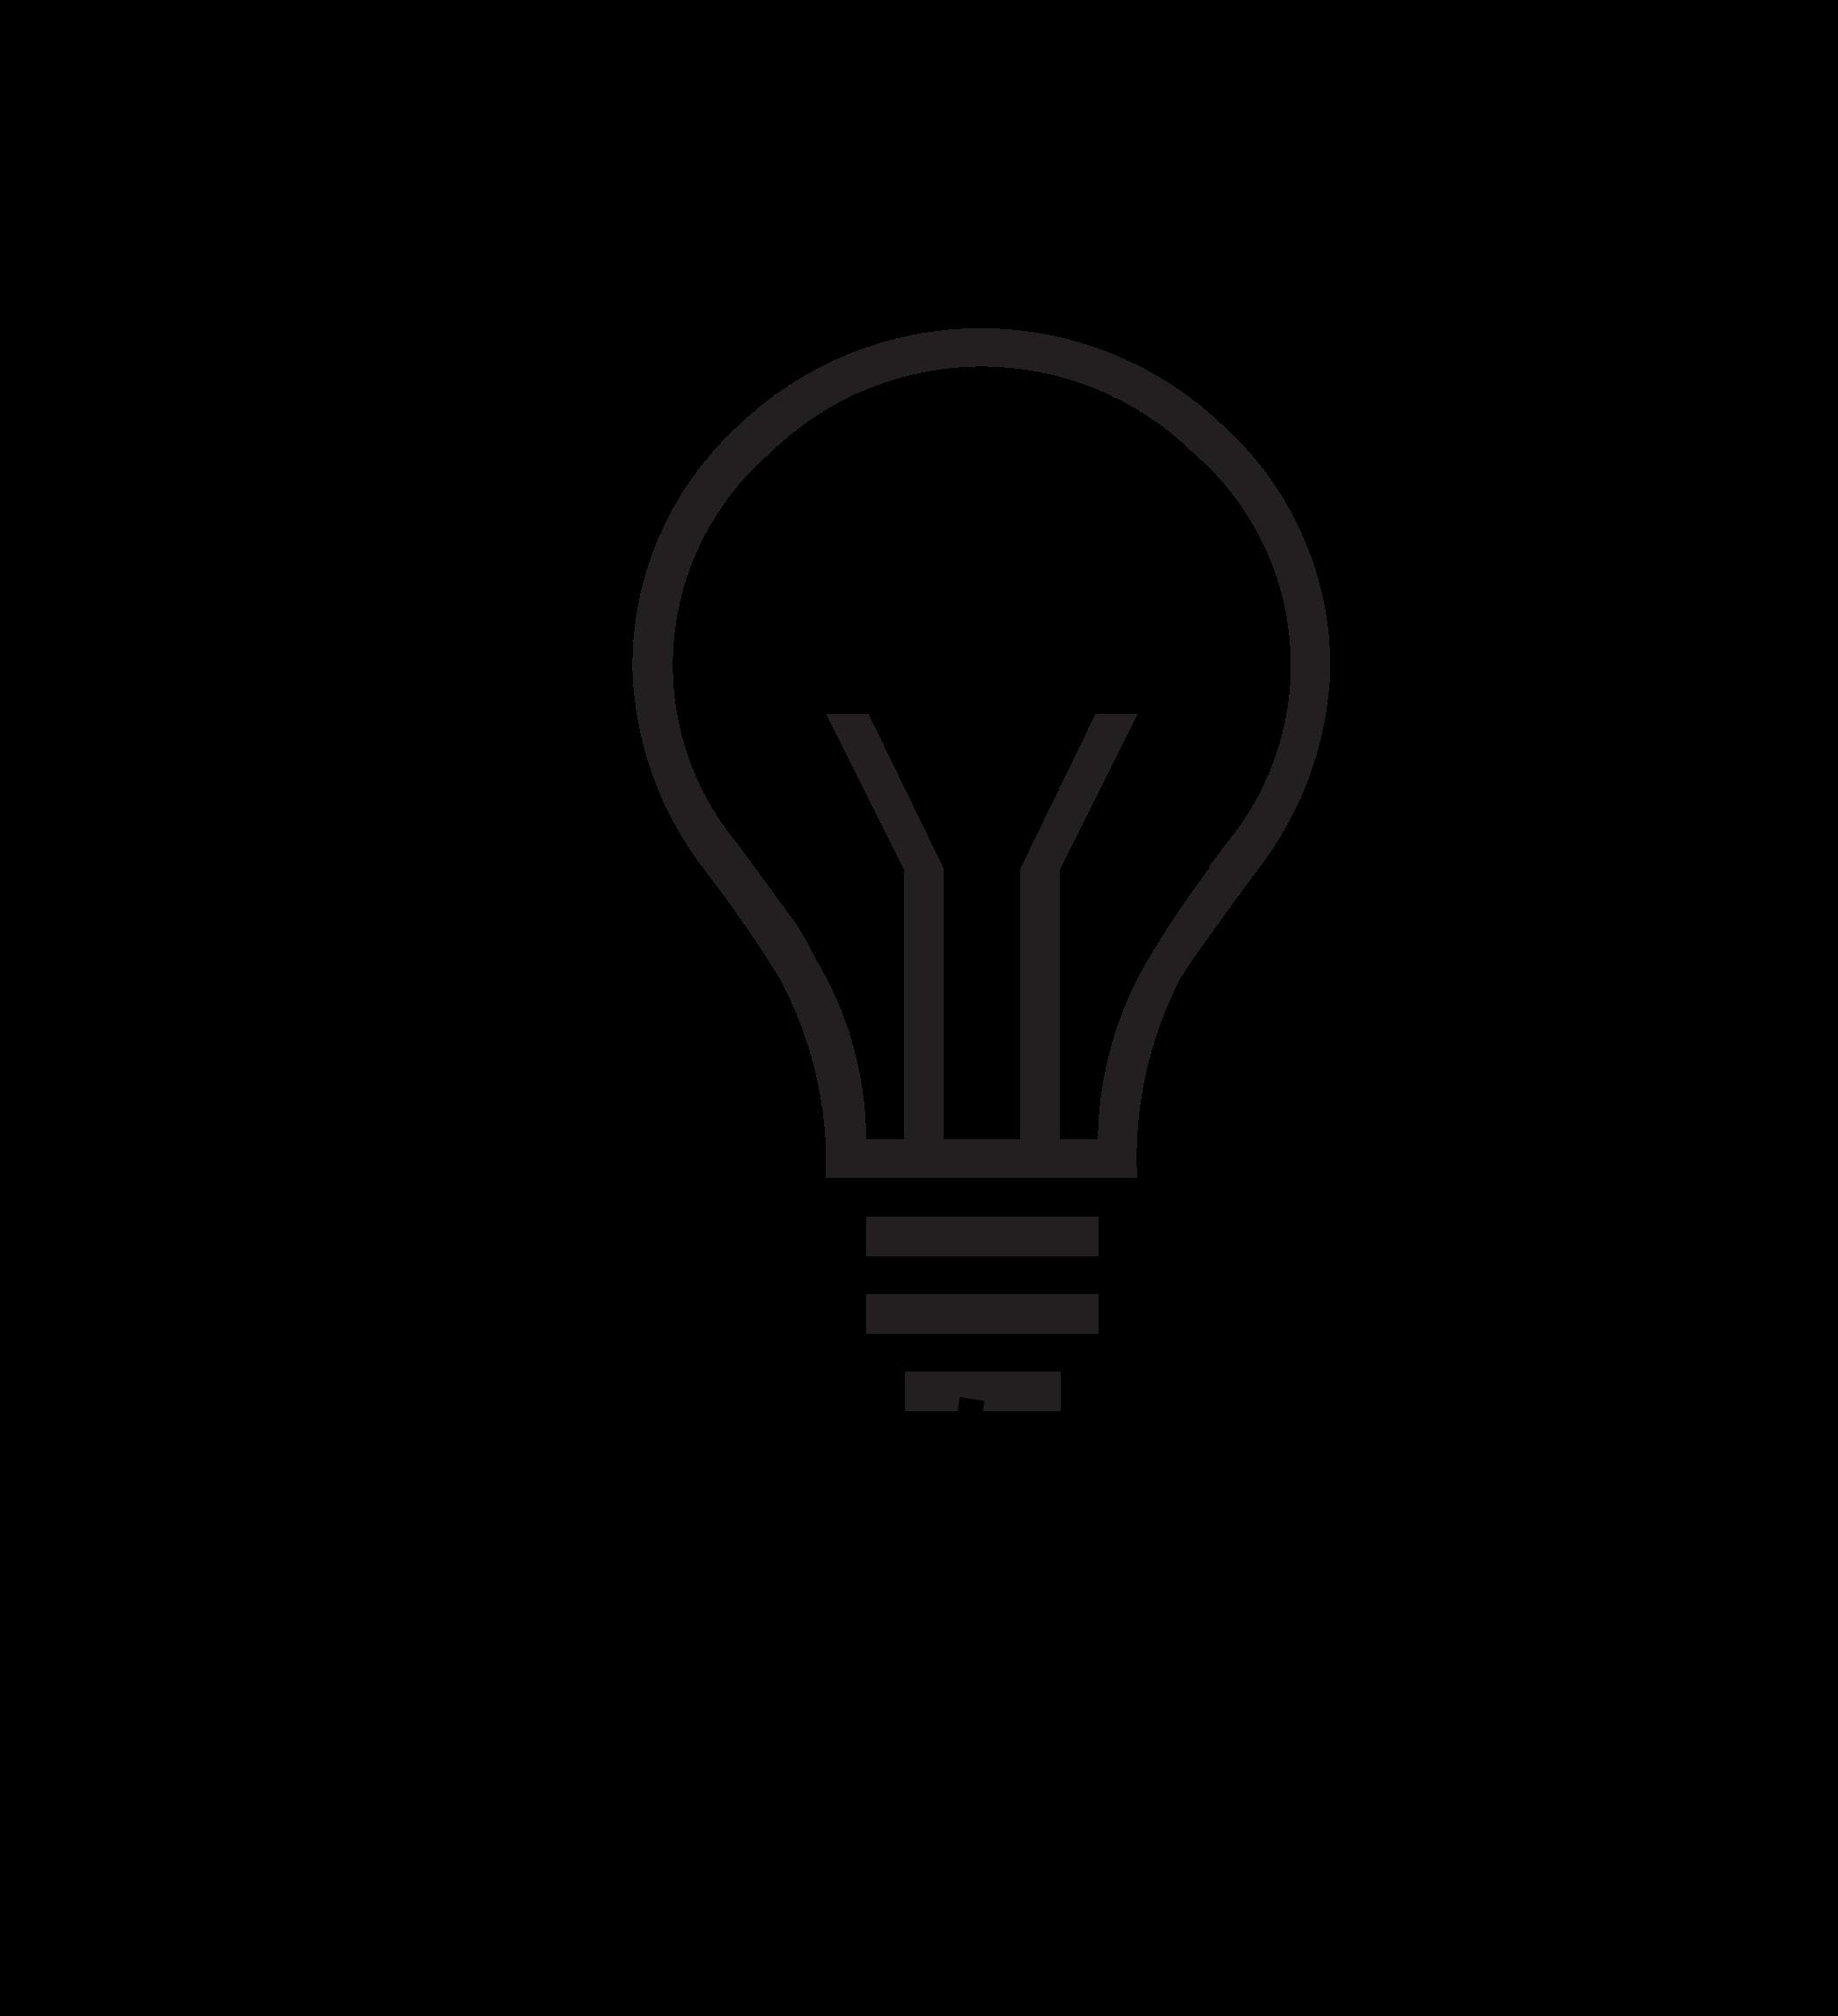 Clipart - Light Bulb Man Silhouette